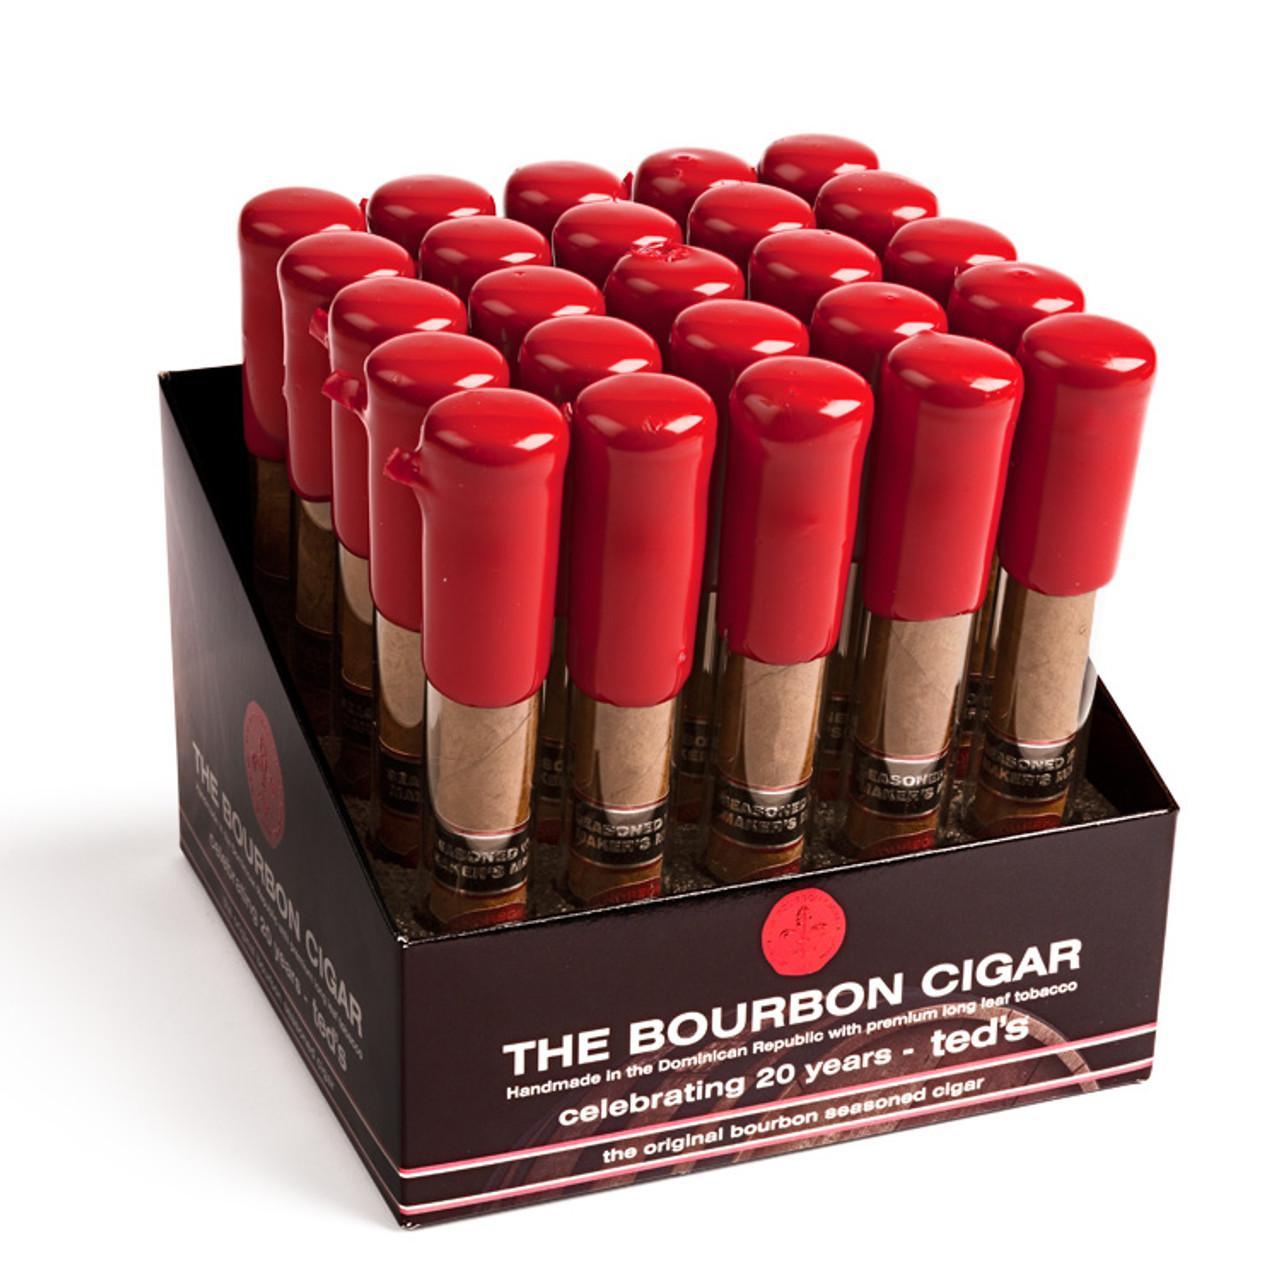 The Bourbon Cigars - Bourbon 650 Cigars - 6 x 50 (Box of 25 Glass Tubes)